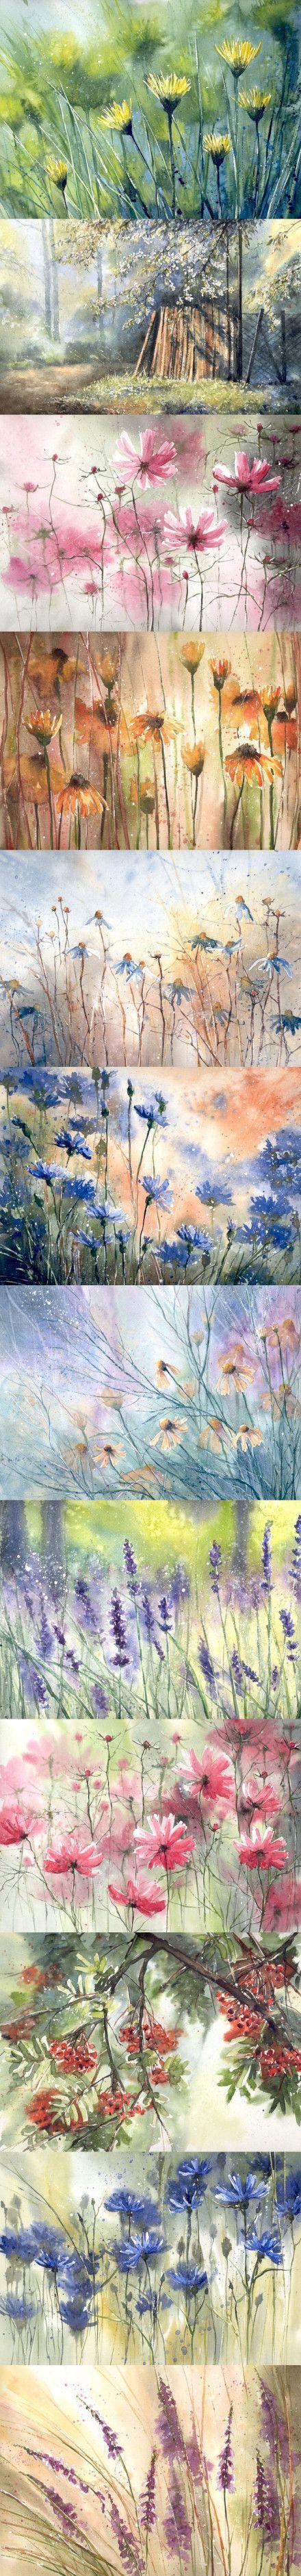 watercolour flowers #watercolor jd